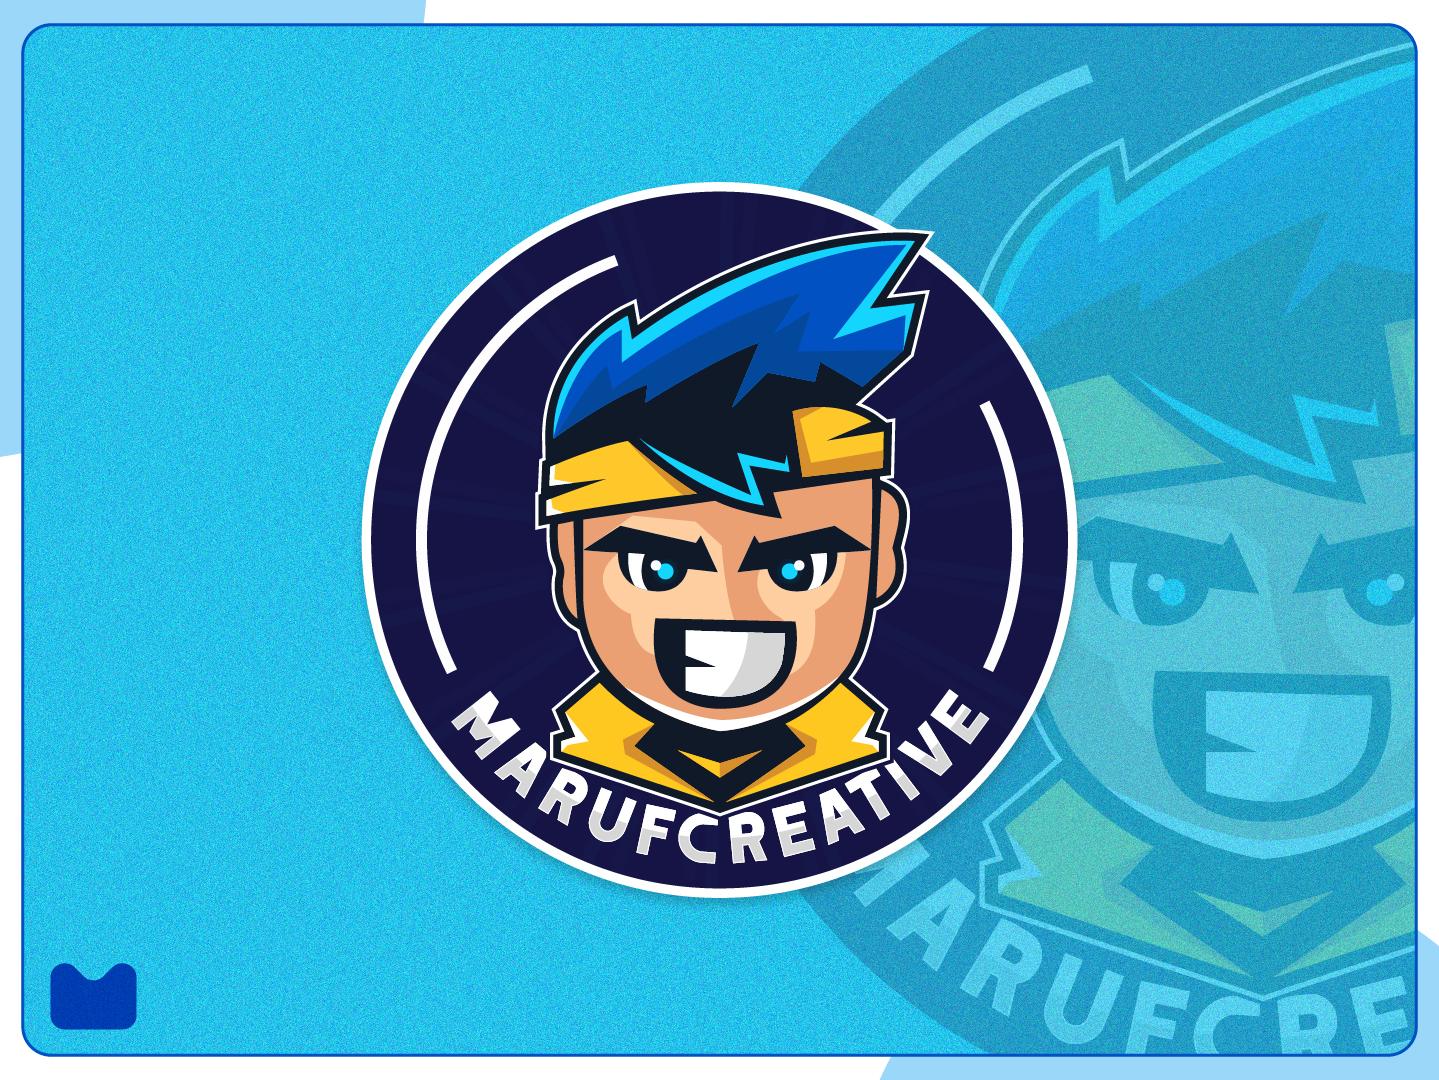 marufcreative mascot logo design esports logo design concept mascot design mascot character logo cartoonmascot illustration streaming games game illustraion vector esport logo esportlogo esports esport mascotlogo mascot logo mascot